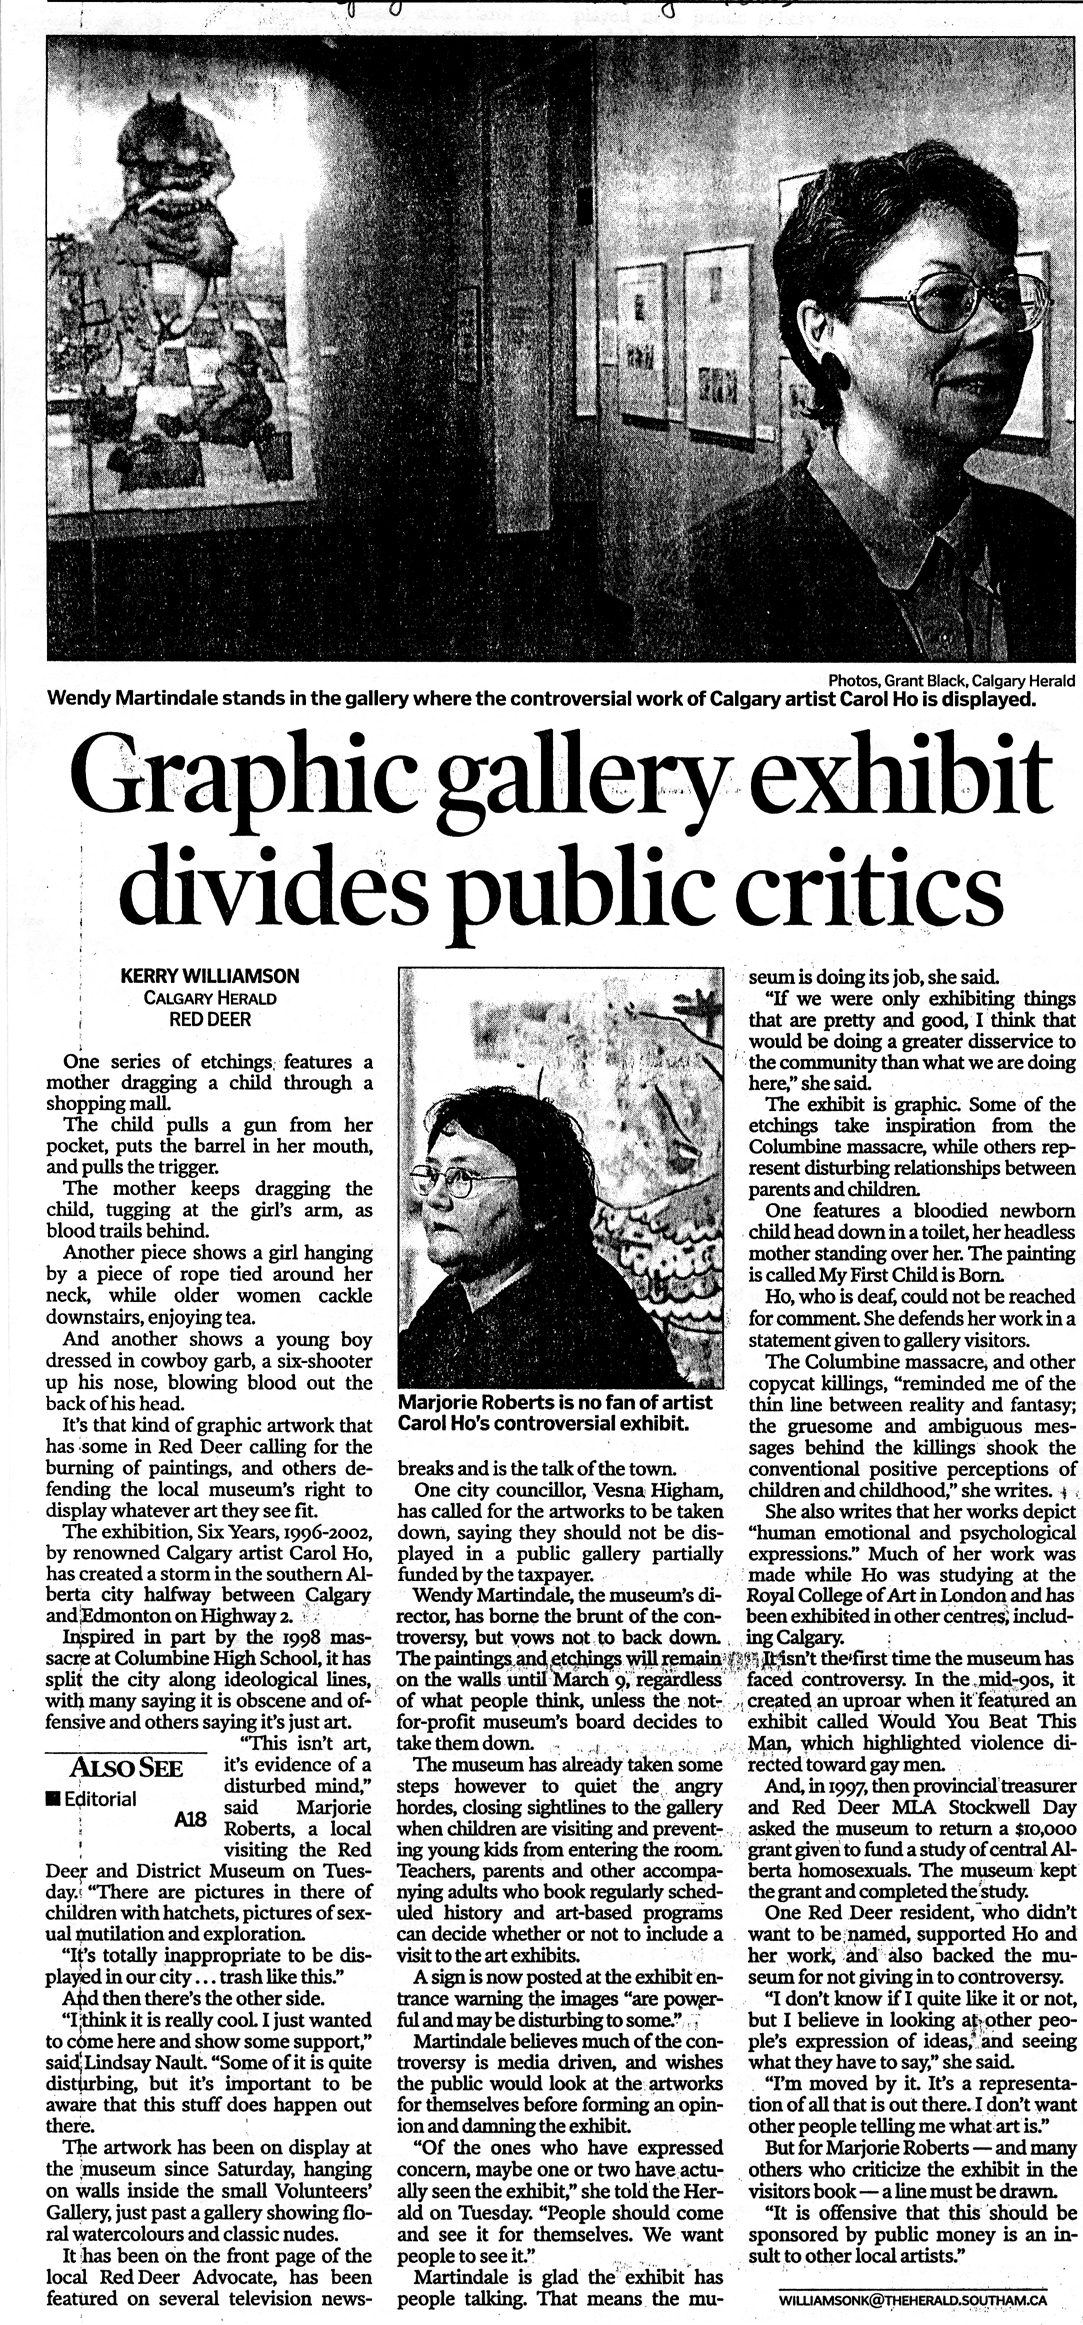 CALGARY HERALD, JAN 15 2003